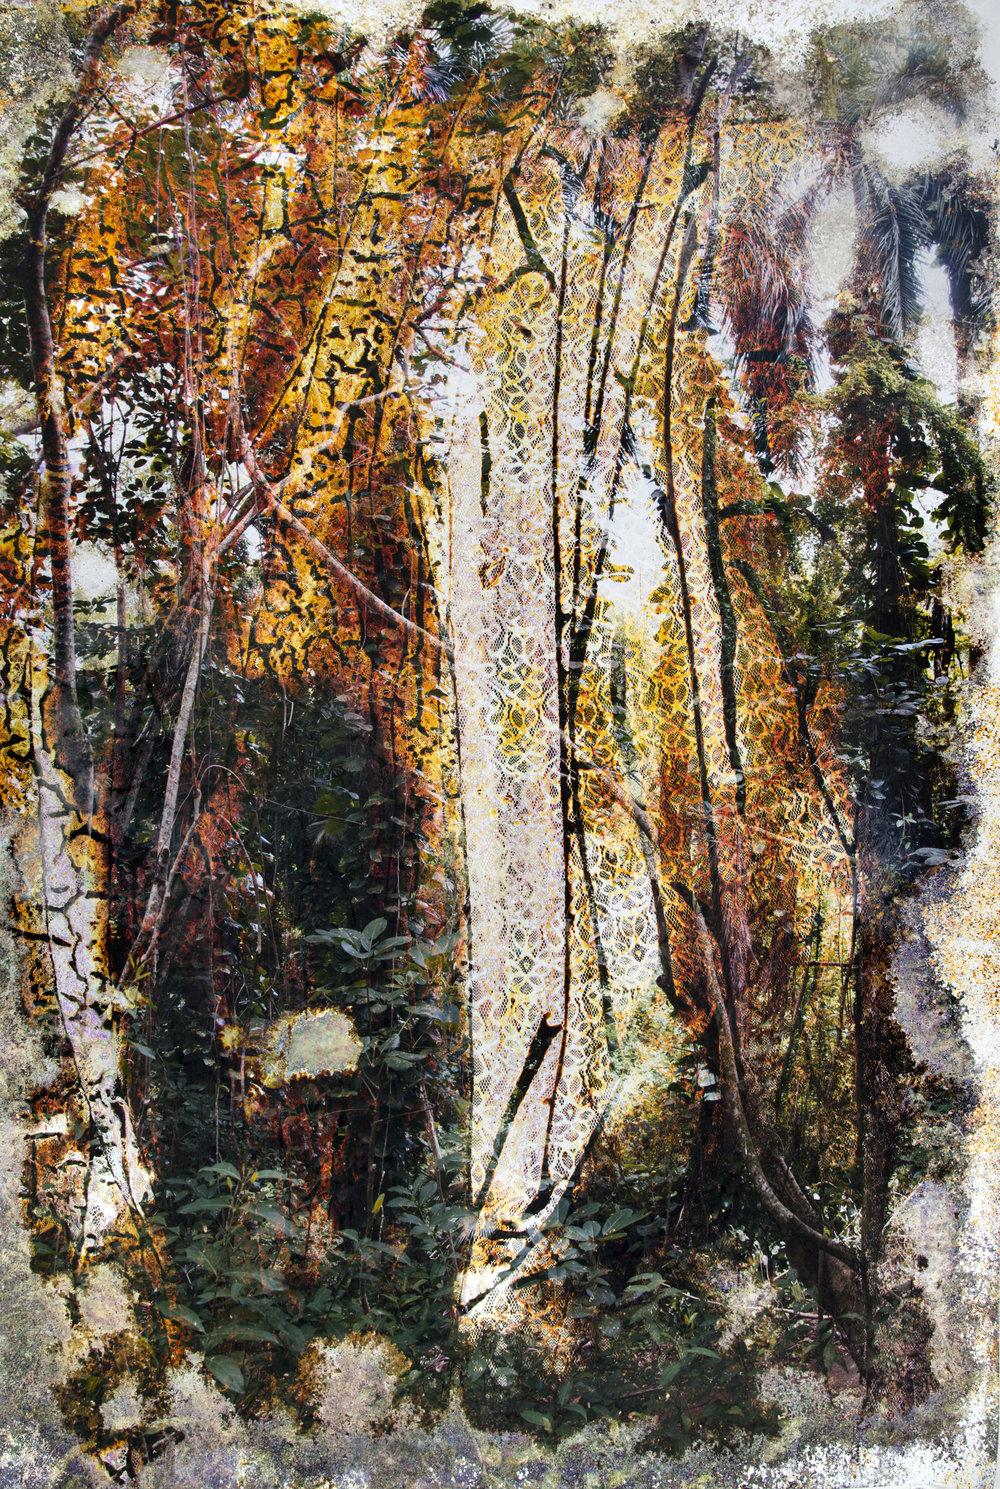 Wai'anae 926015, 2015 c-print buried in Wai'anae, Hawai'i 233 x 152 cm - 91 3/4 x 59 7/8 inches